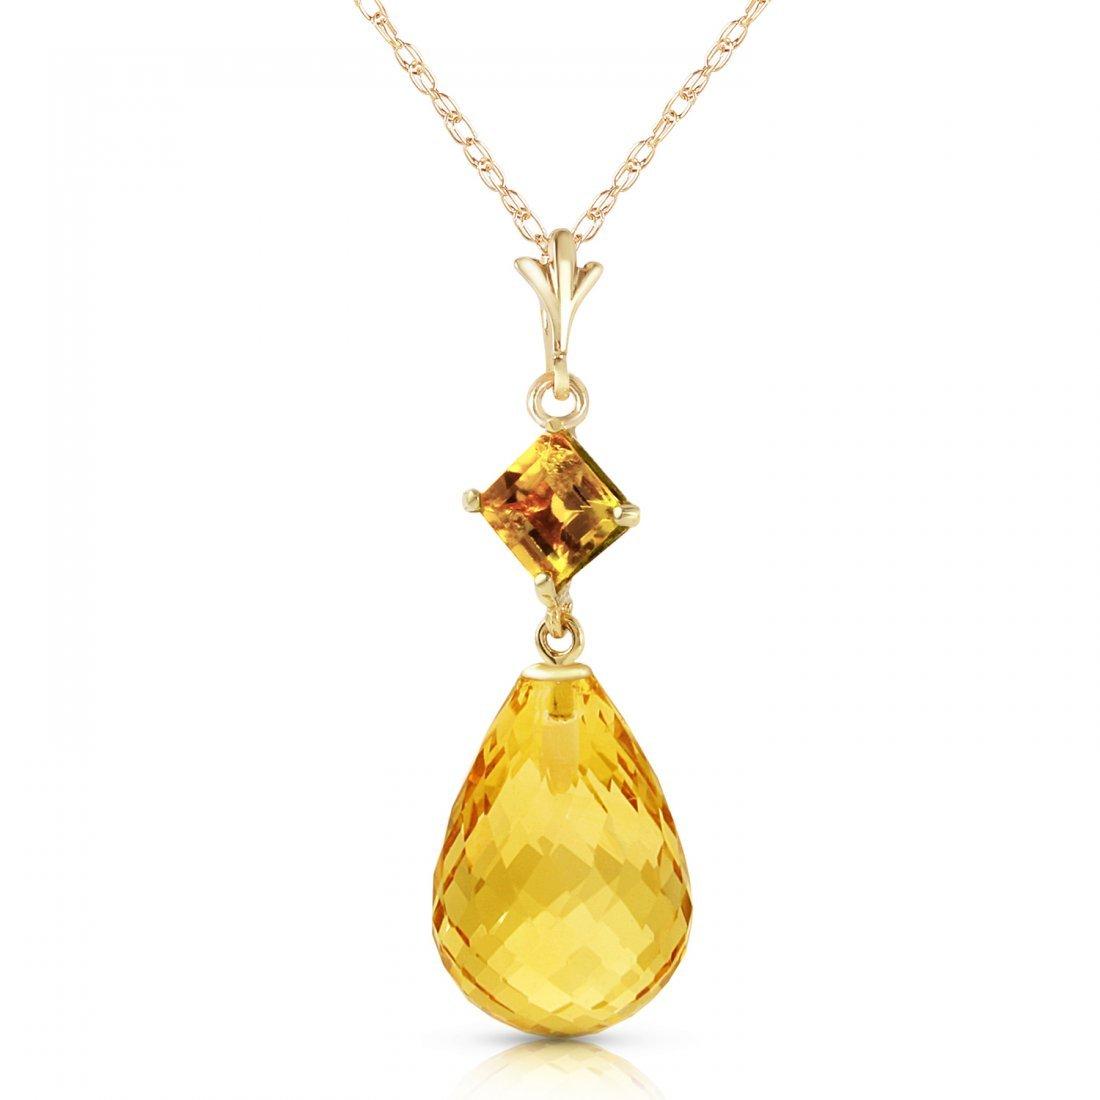 Genuine 5.5 ctw Citrine Necklace Jewelry 14KT Yellow